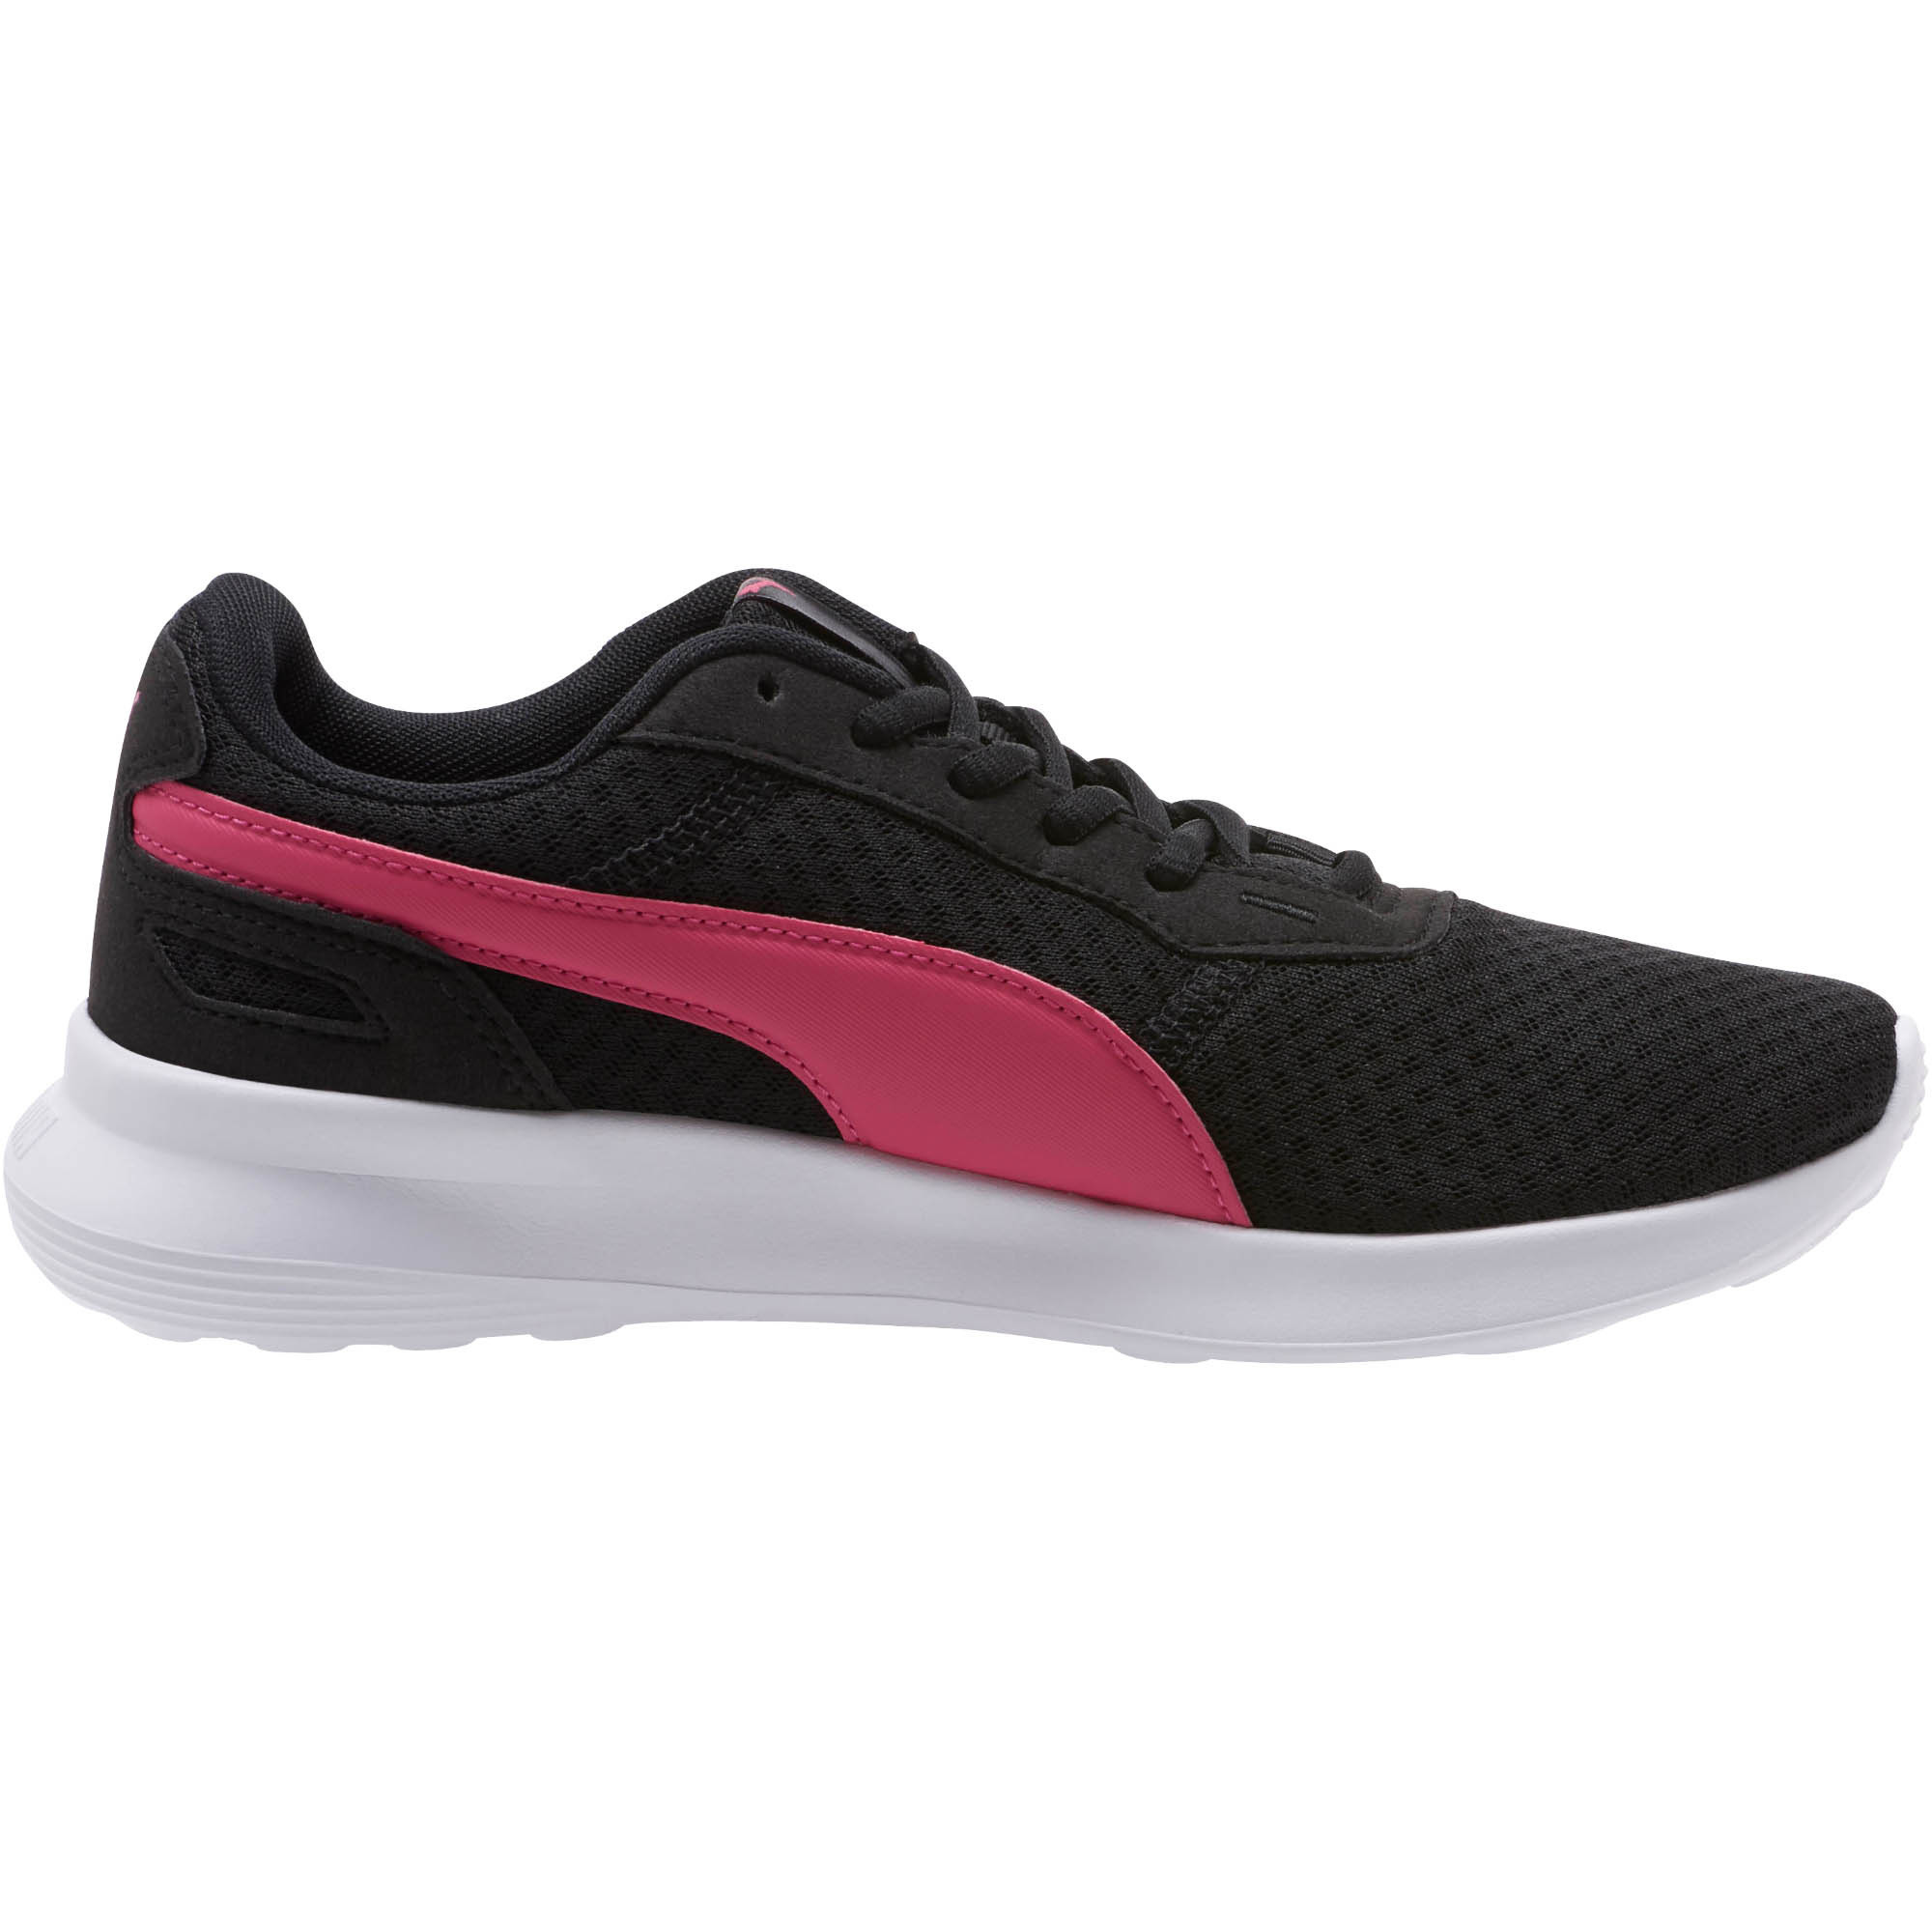 PUMA-ST-Activate-Women-s-Sneakers-Women-Shoe-Basics thumbnail 10